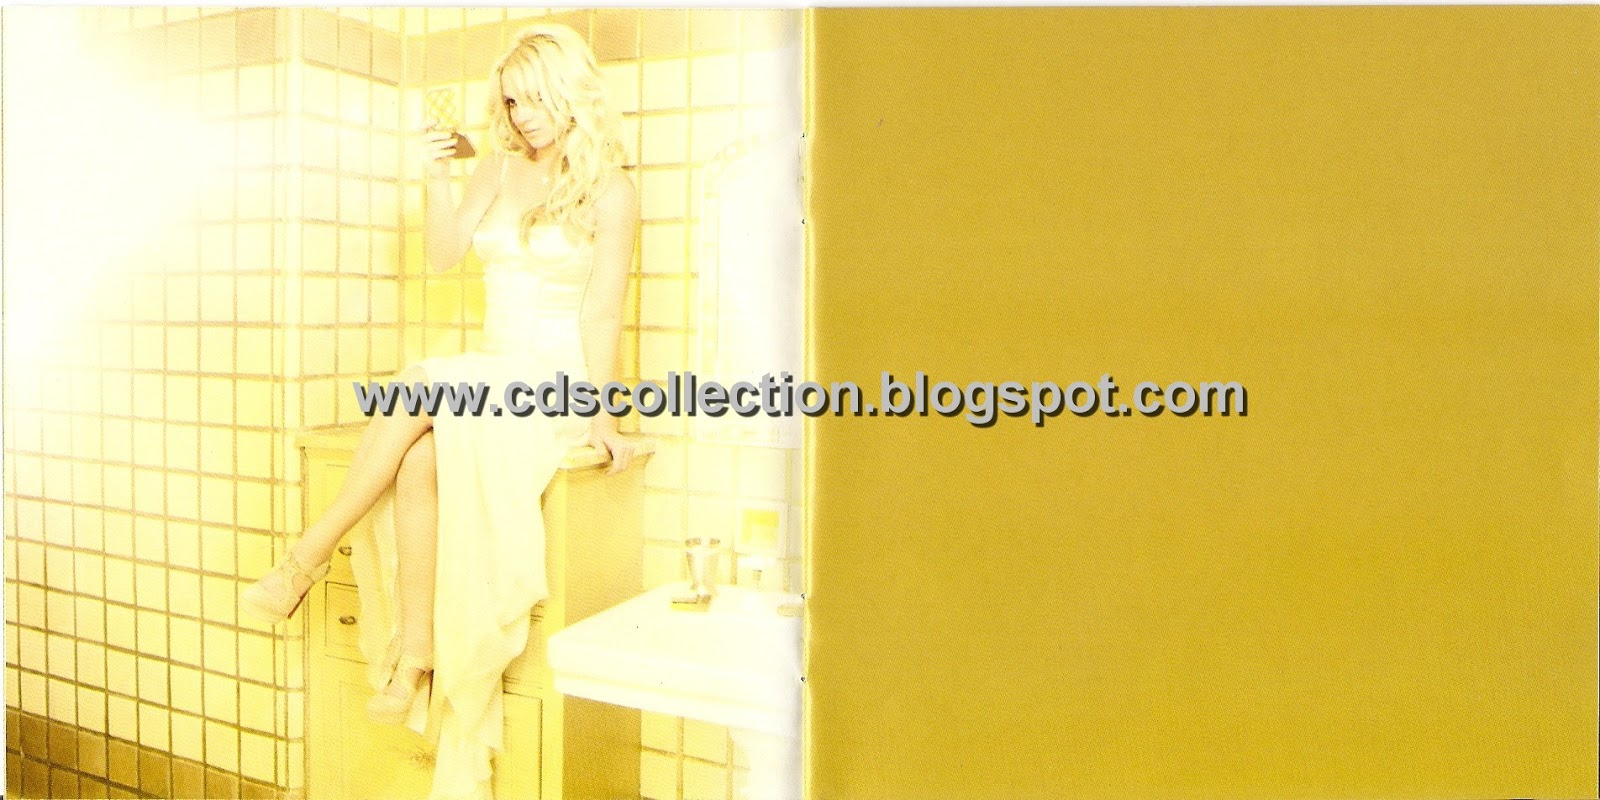 http://3.bp.blogspot.com/-8NPm39hnoPw/TjGmNAfczNI/AAAAAAAAPz0/jxfkfEn_S6o/s1600/digitalizar0004.jpg